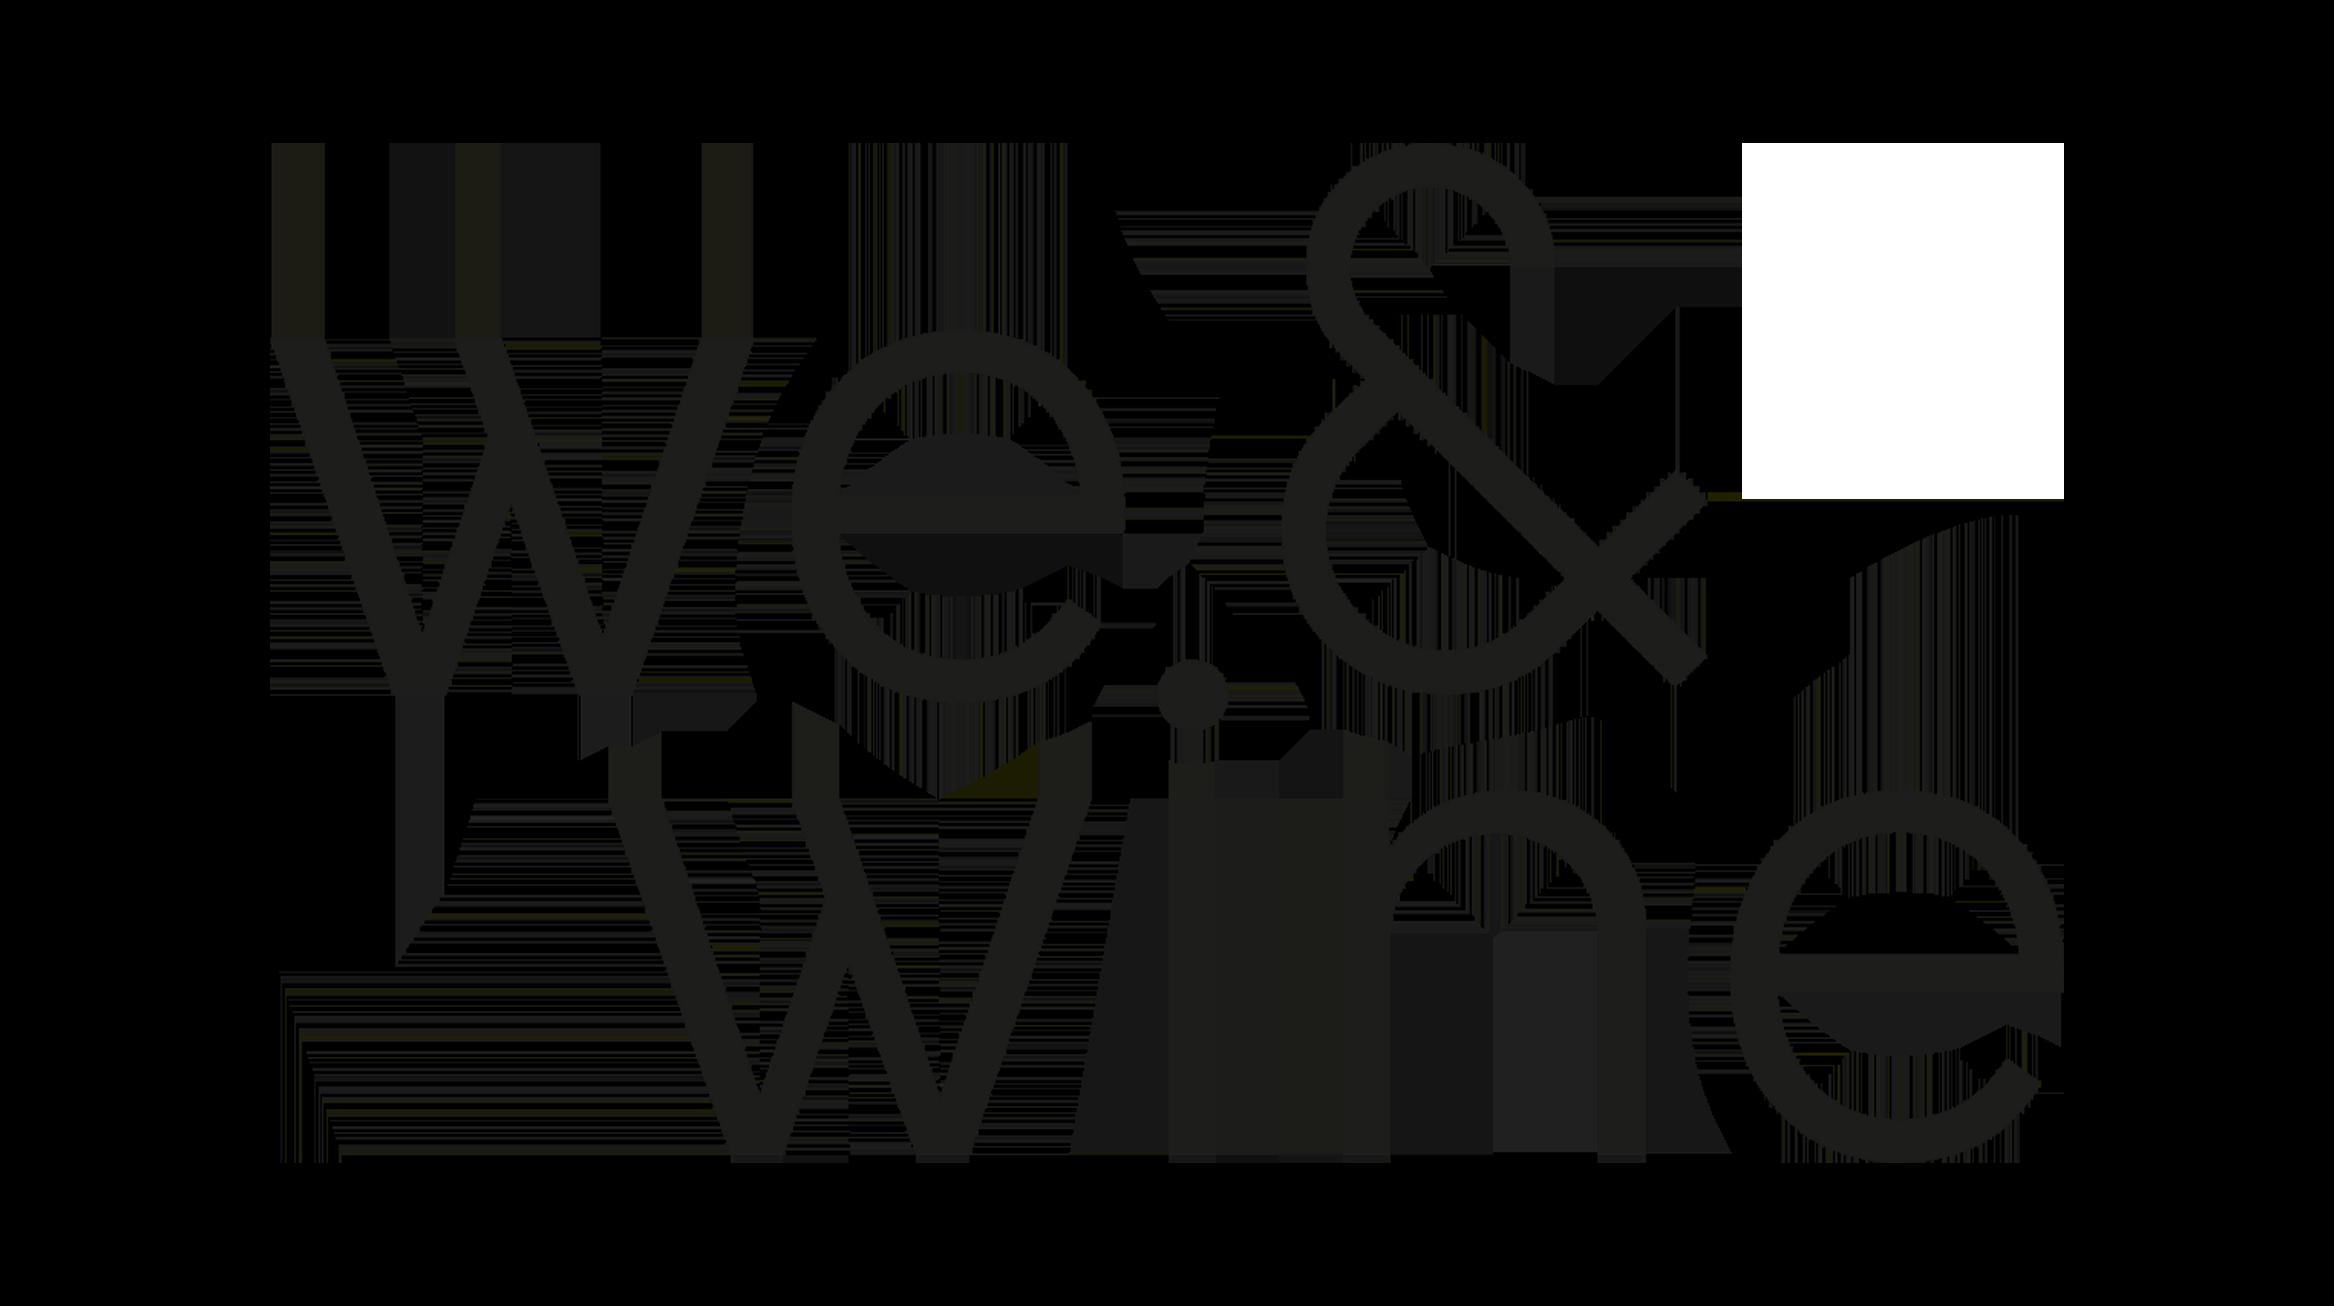 logos_weandwine